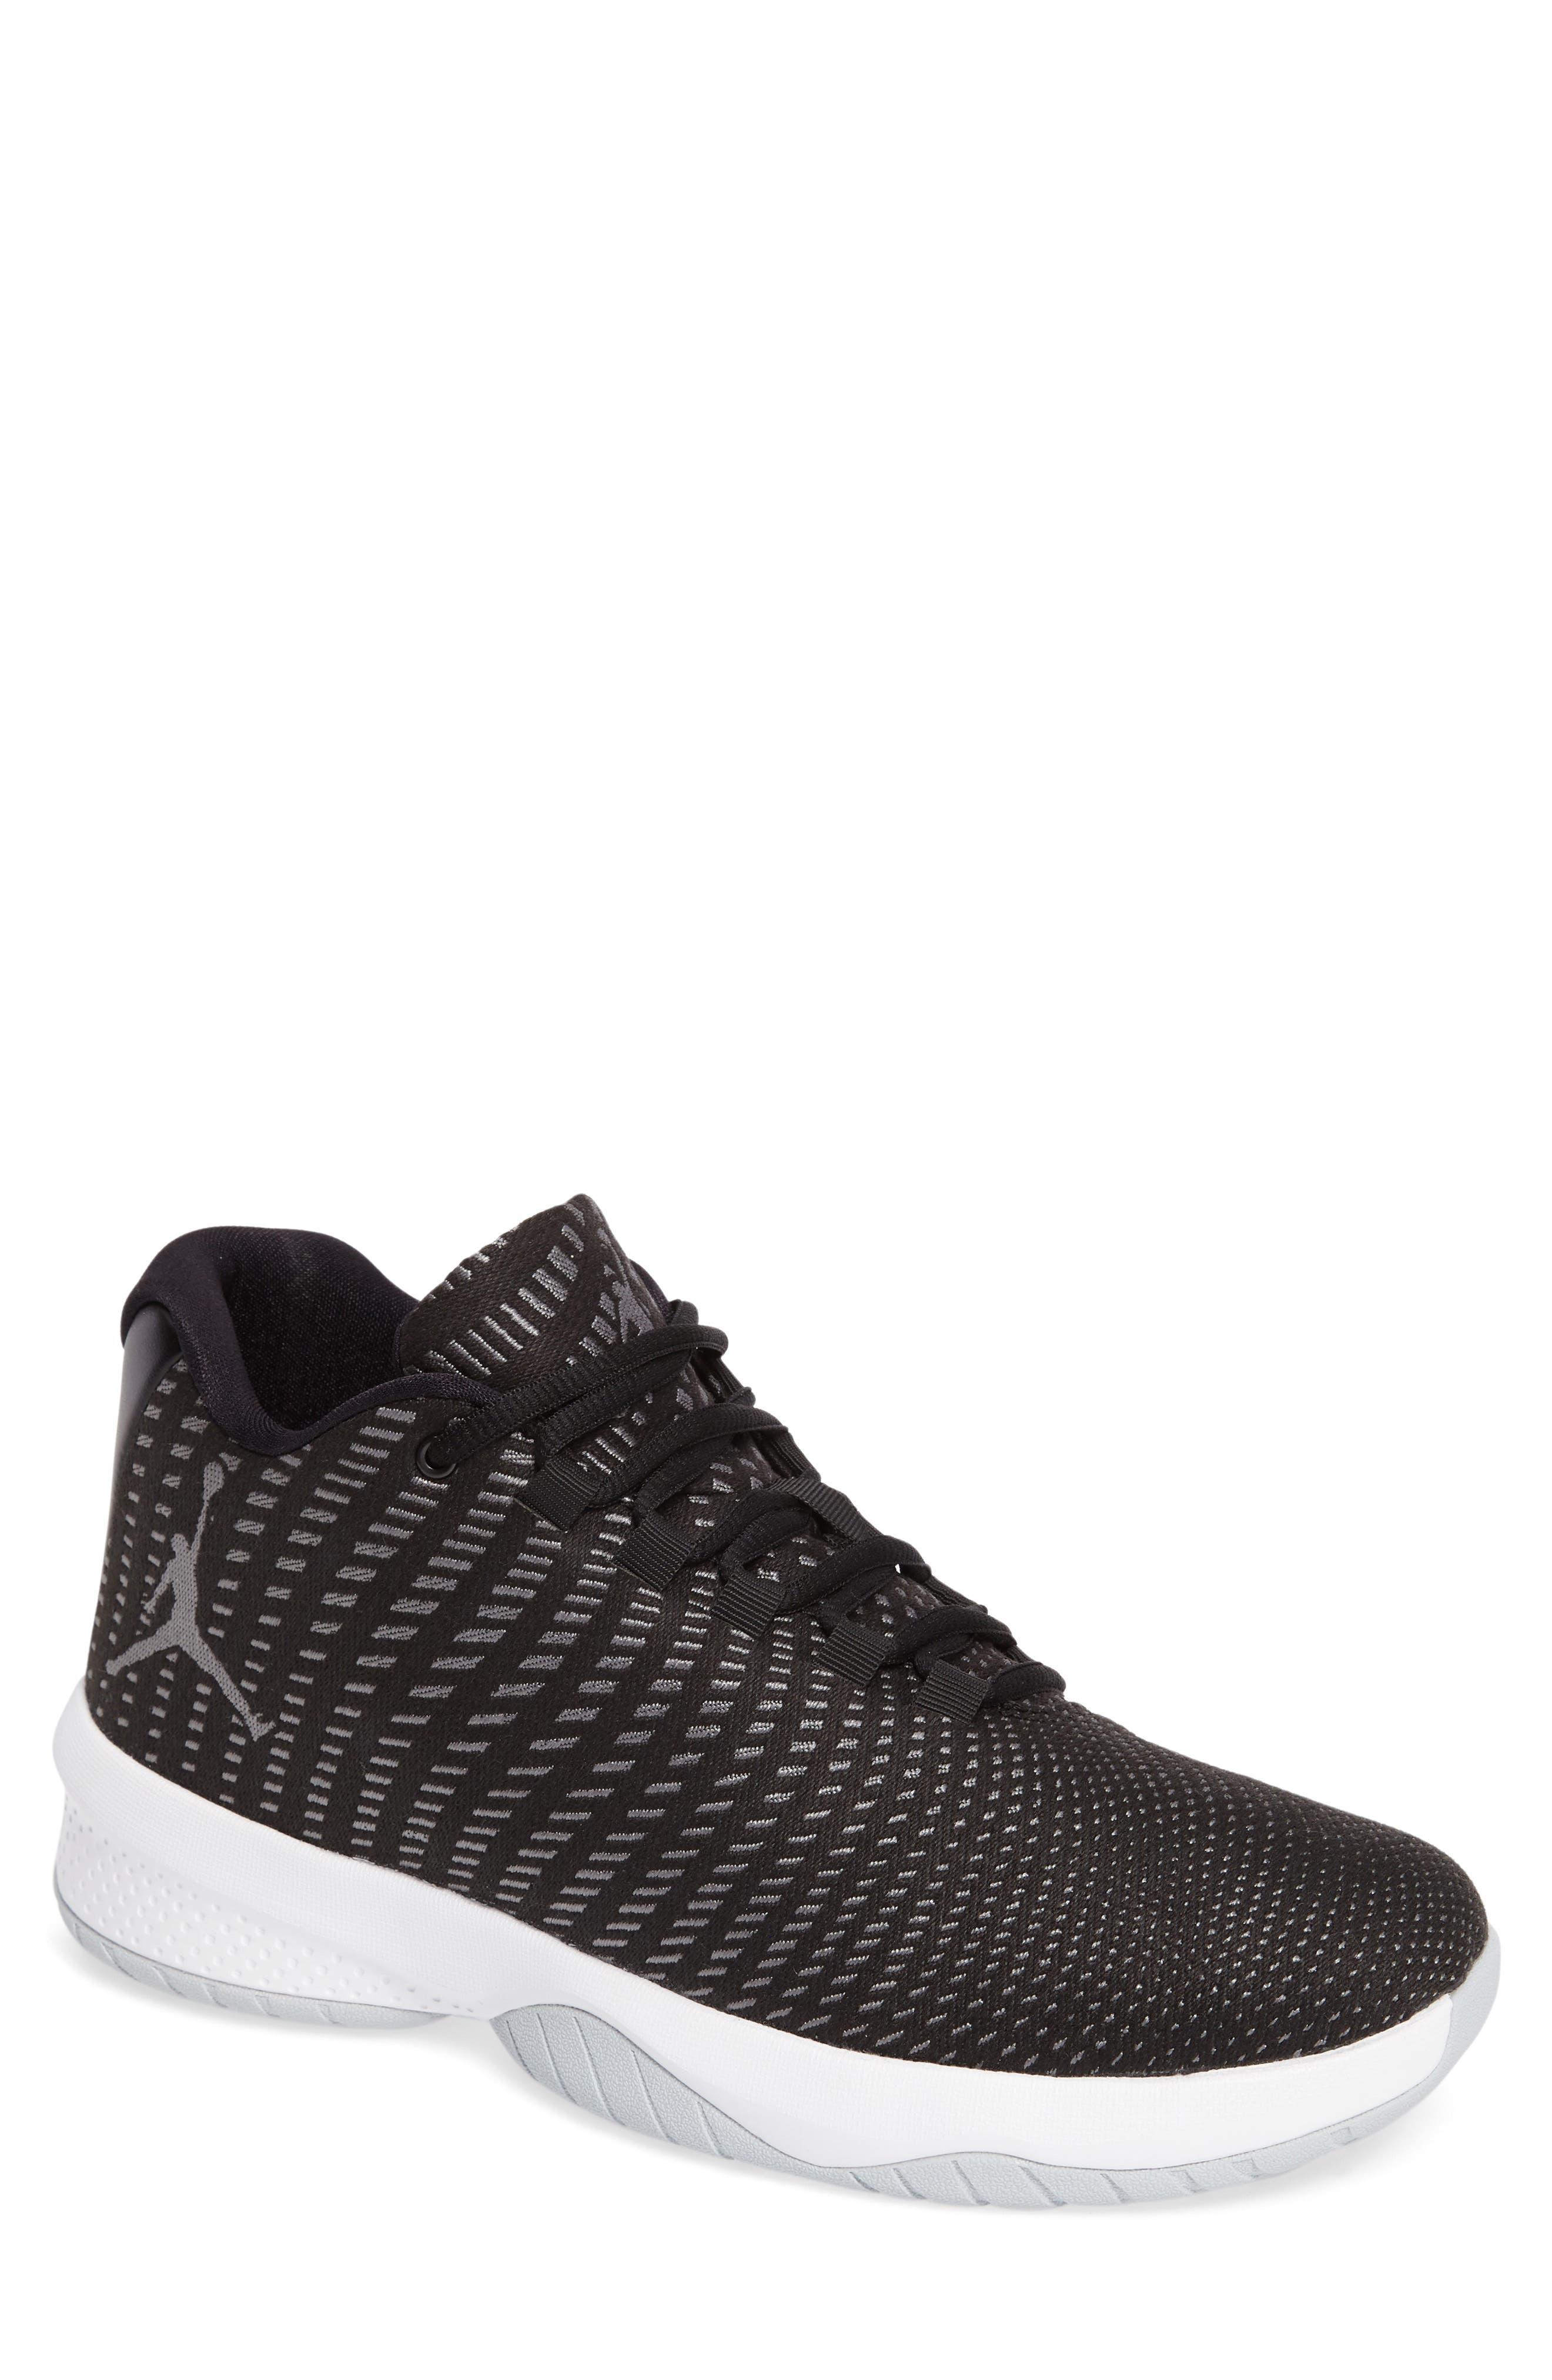 Alternate Image 1 Selected - Nike Jordan B. Fly Basketball Shoe (Men)